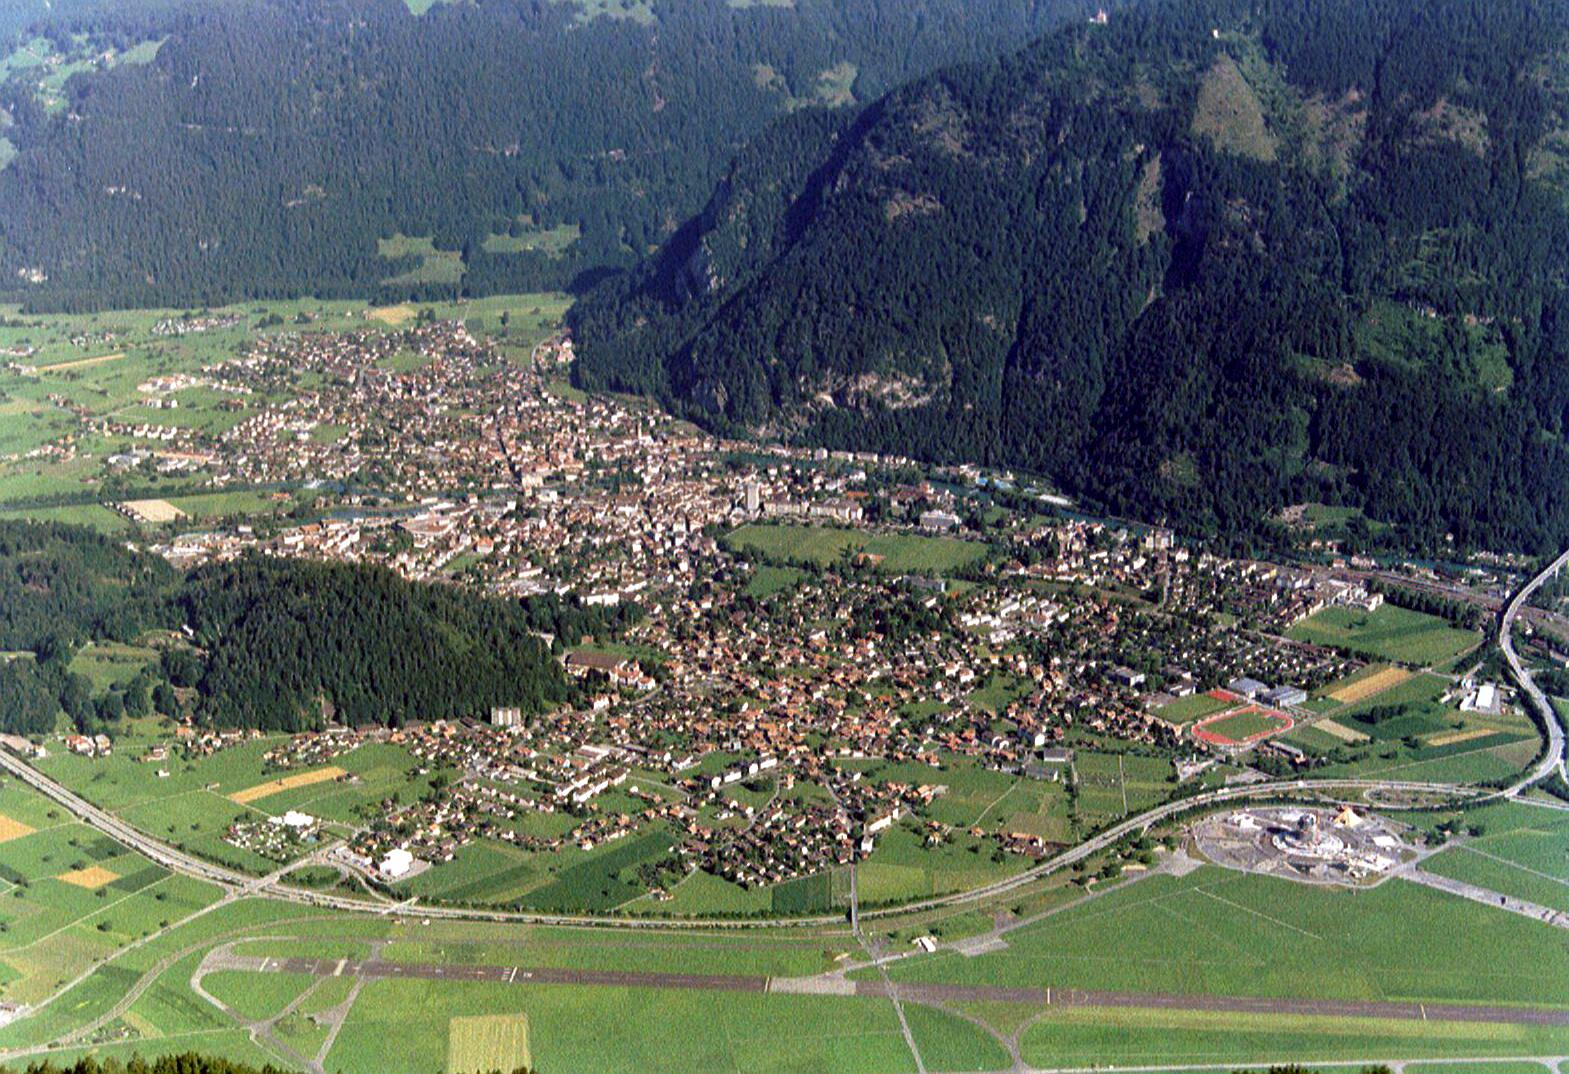 [suisse] Le vwspirit ontour du 27 au 30 mai 2009 Interlaken,_Zwitserland